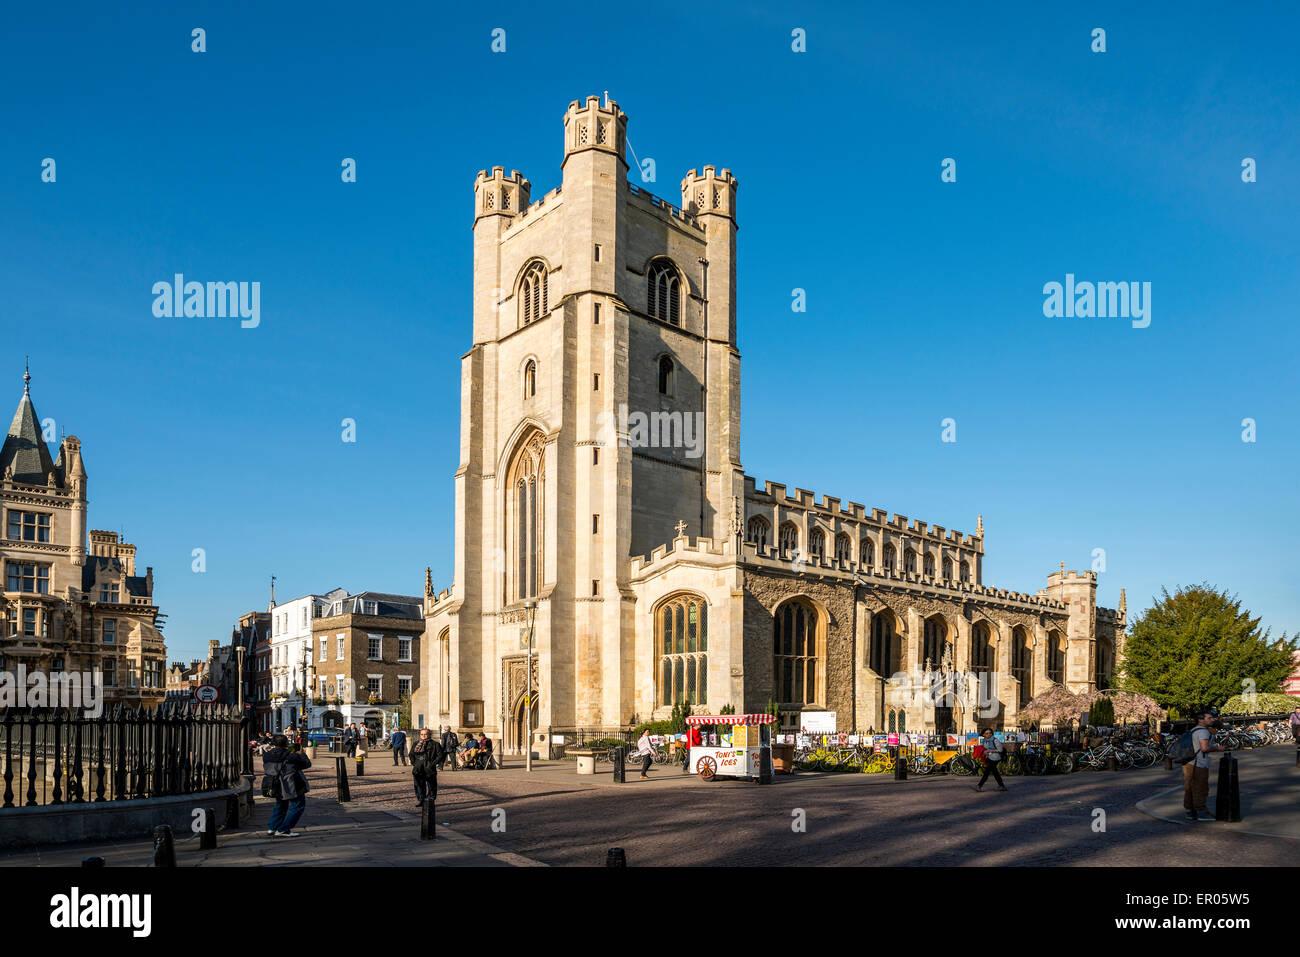 Great St Mary's Church is the University Church of Cambridge University - Stock Image